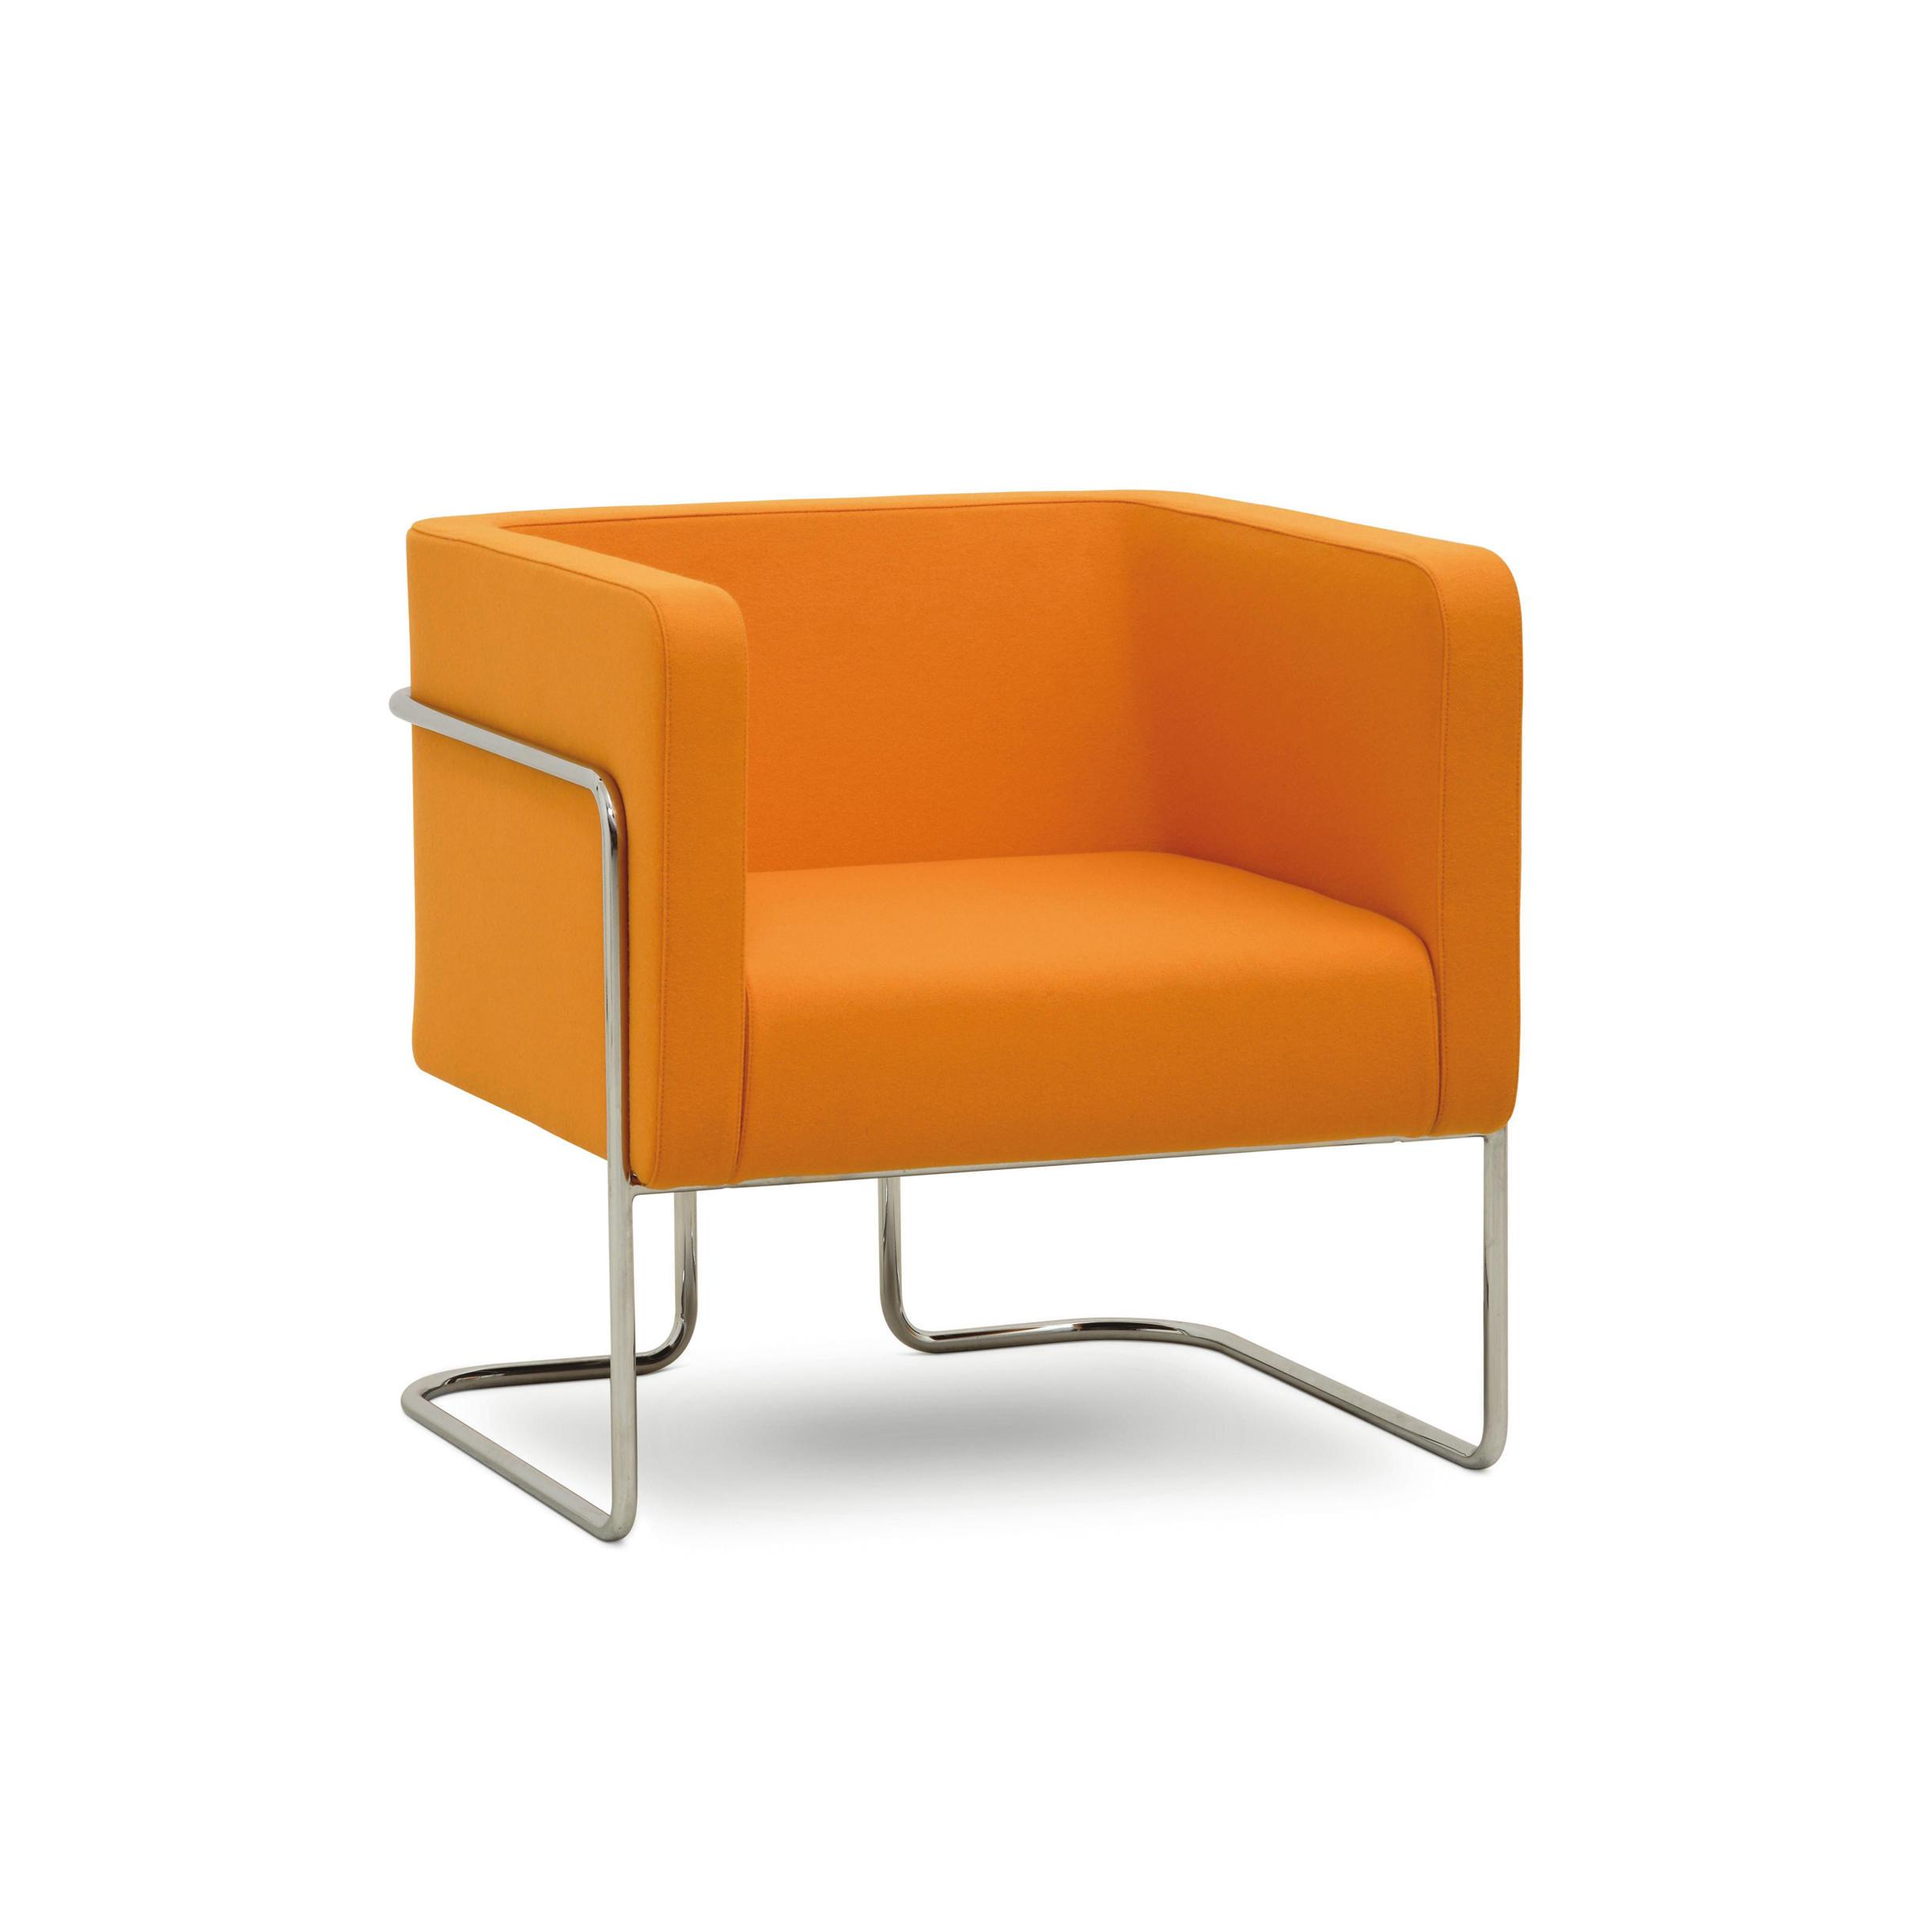 Hiu0026Lo Single Sofa Lo By Nurus | Lounge Chairs ...